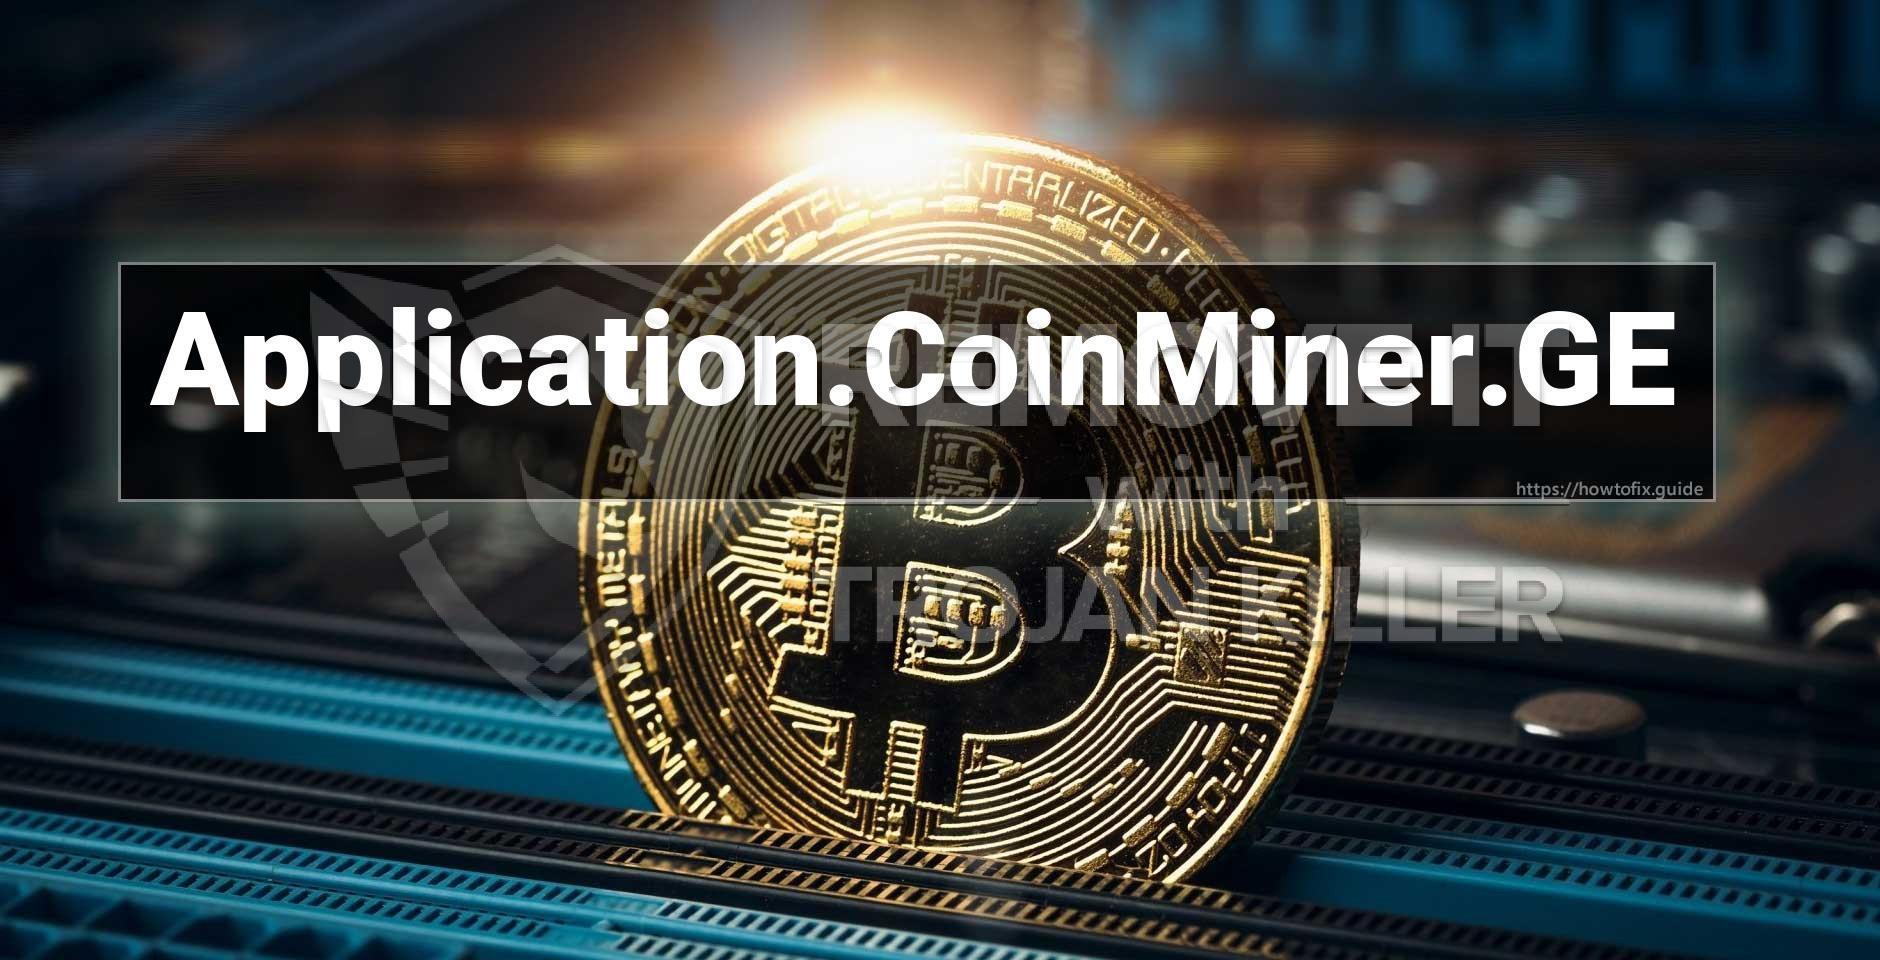 Application.CoinMiner.GE 무엇입니까?